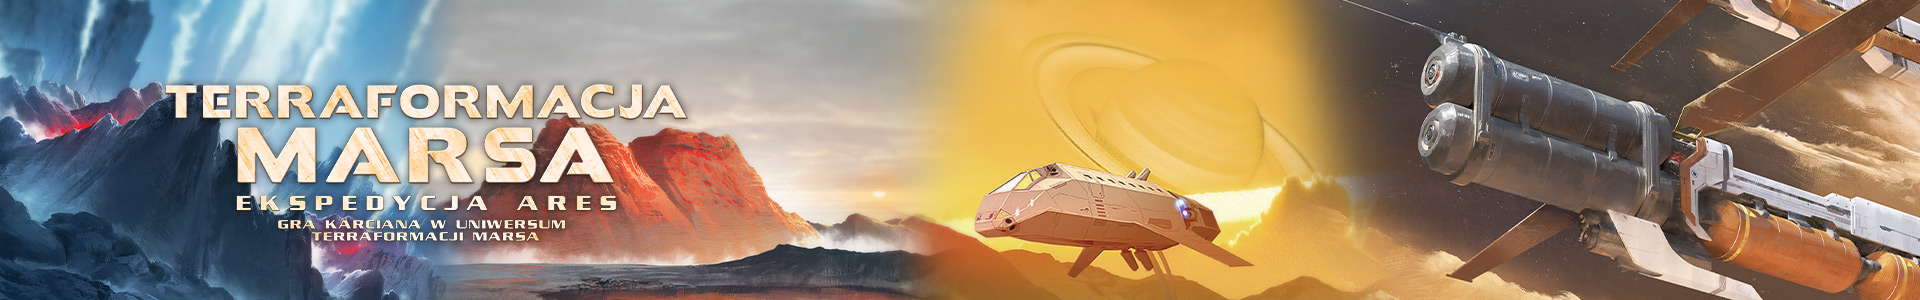 Terraformacja Marsa ARES ekspedycja